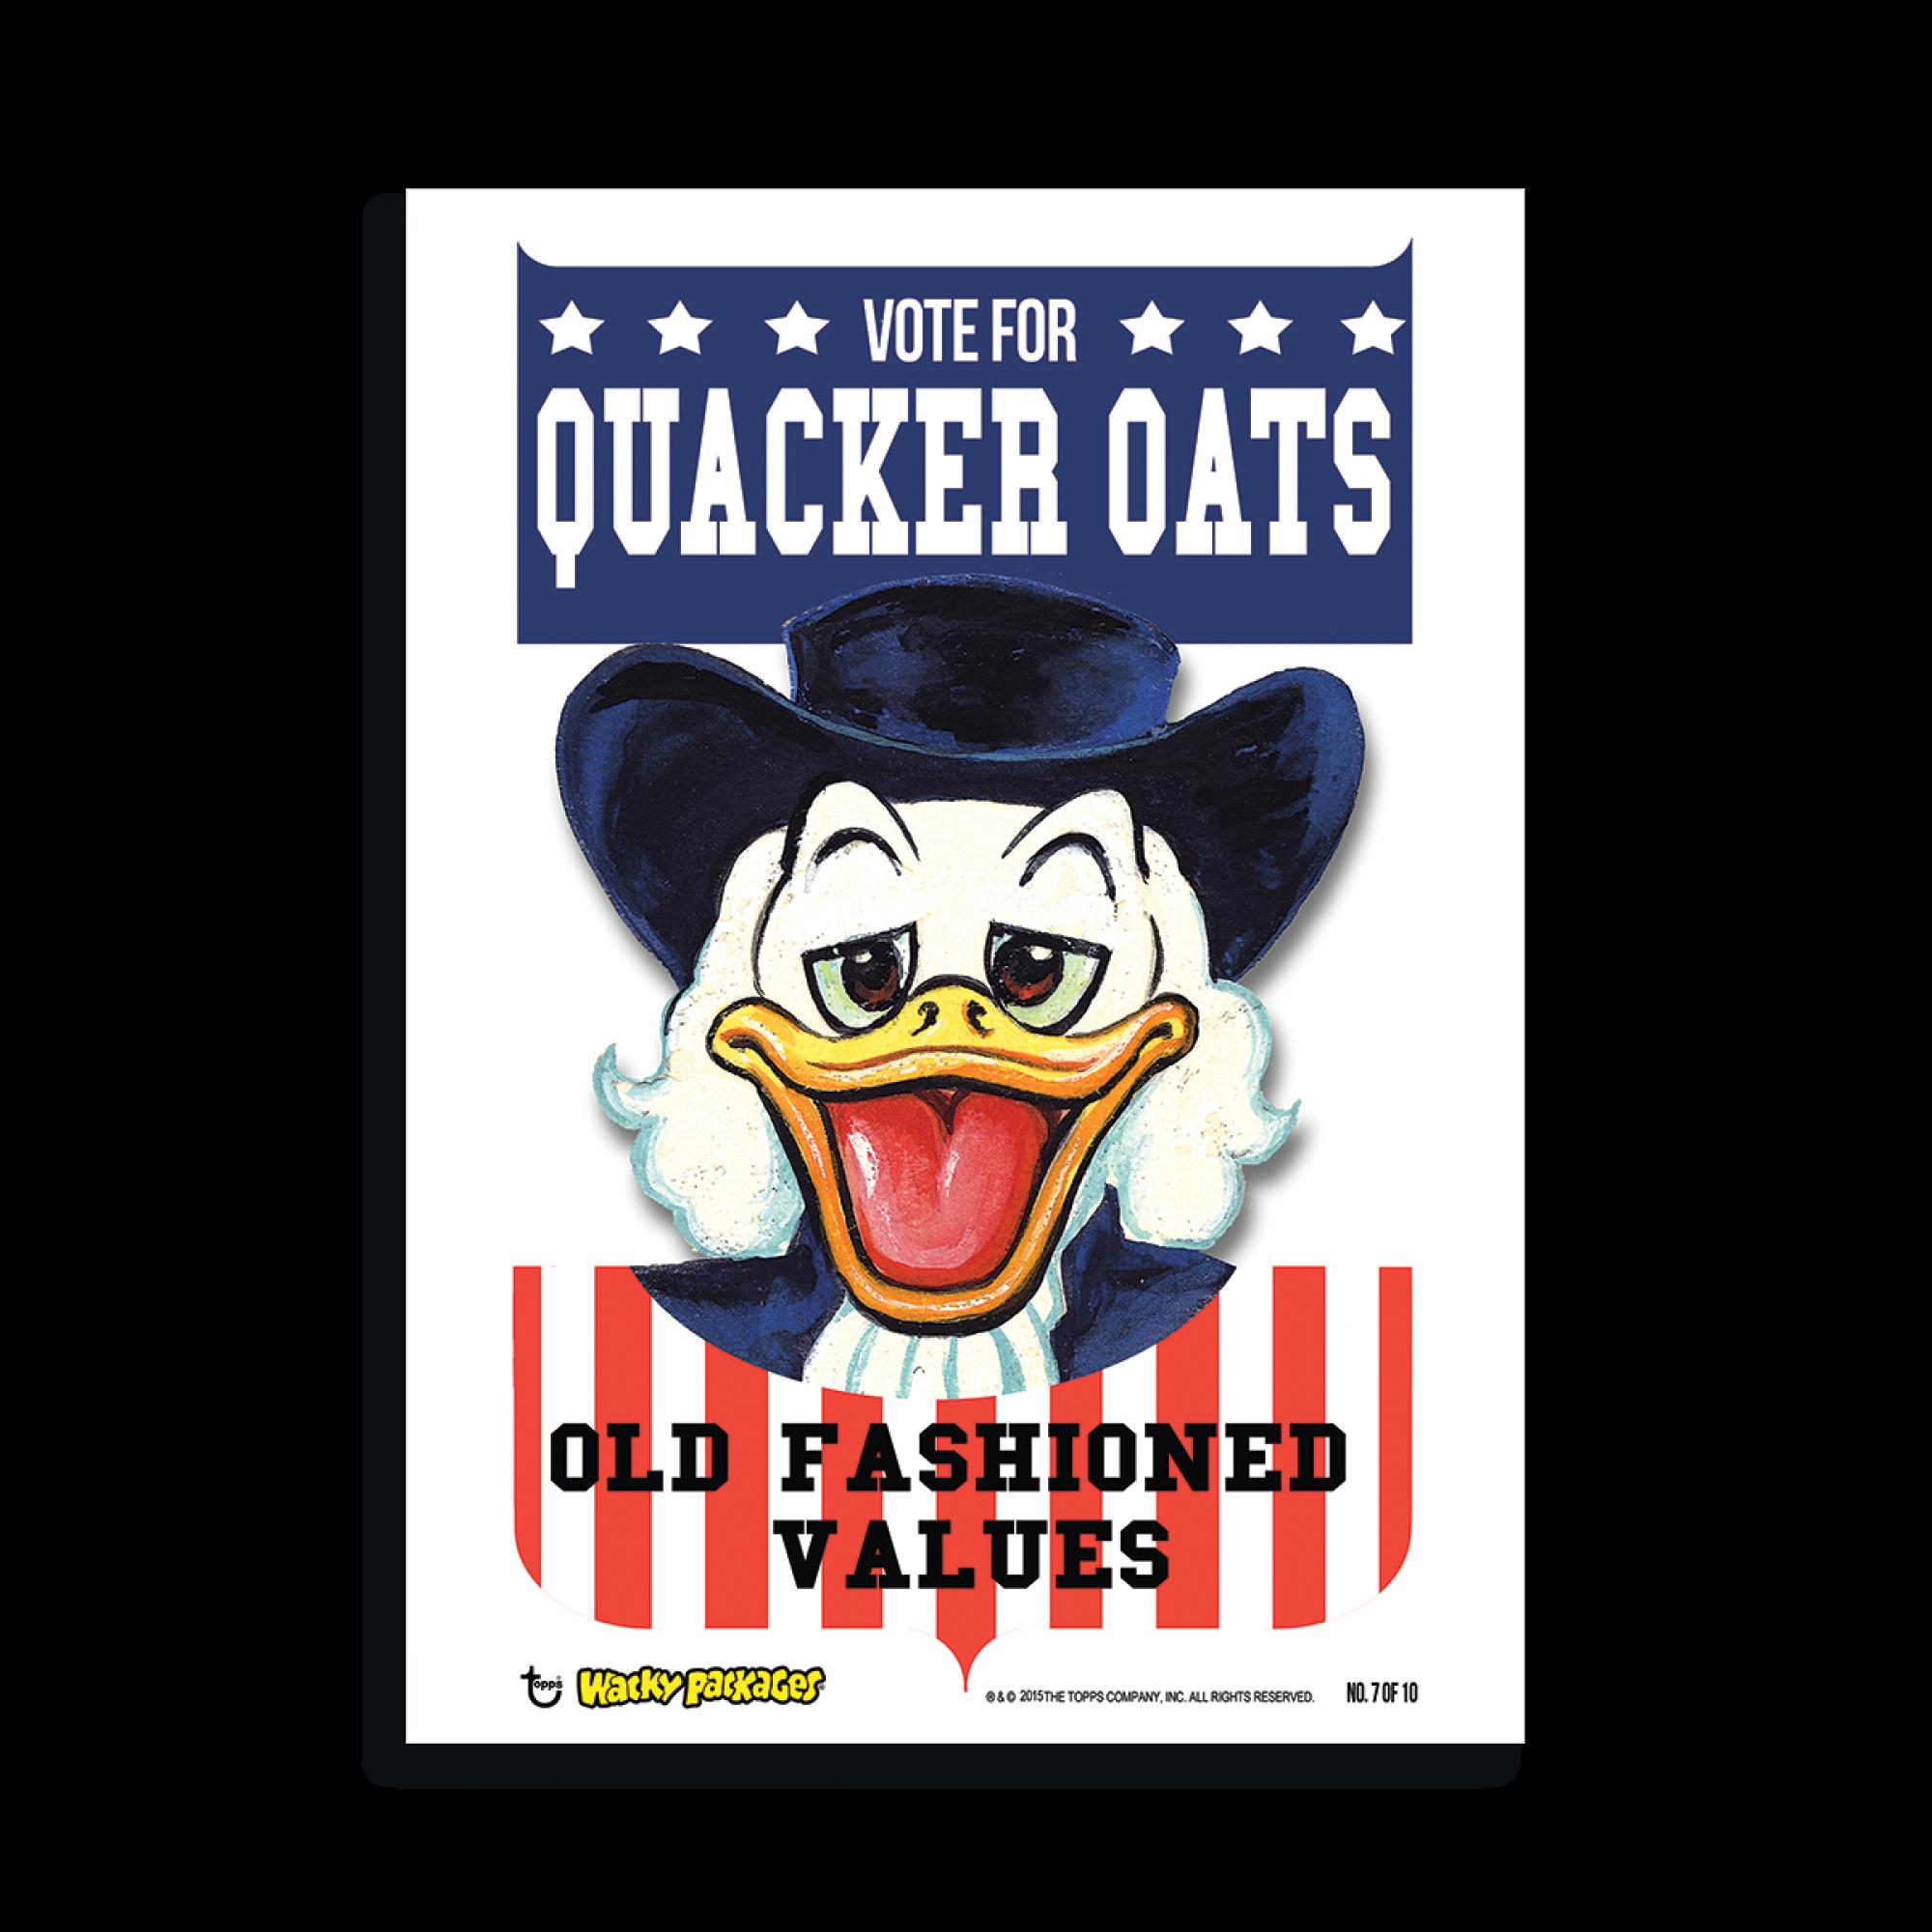 2015 Wacky Packages Parody Art Prints. Quacker Oats TO